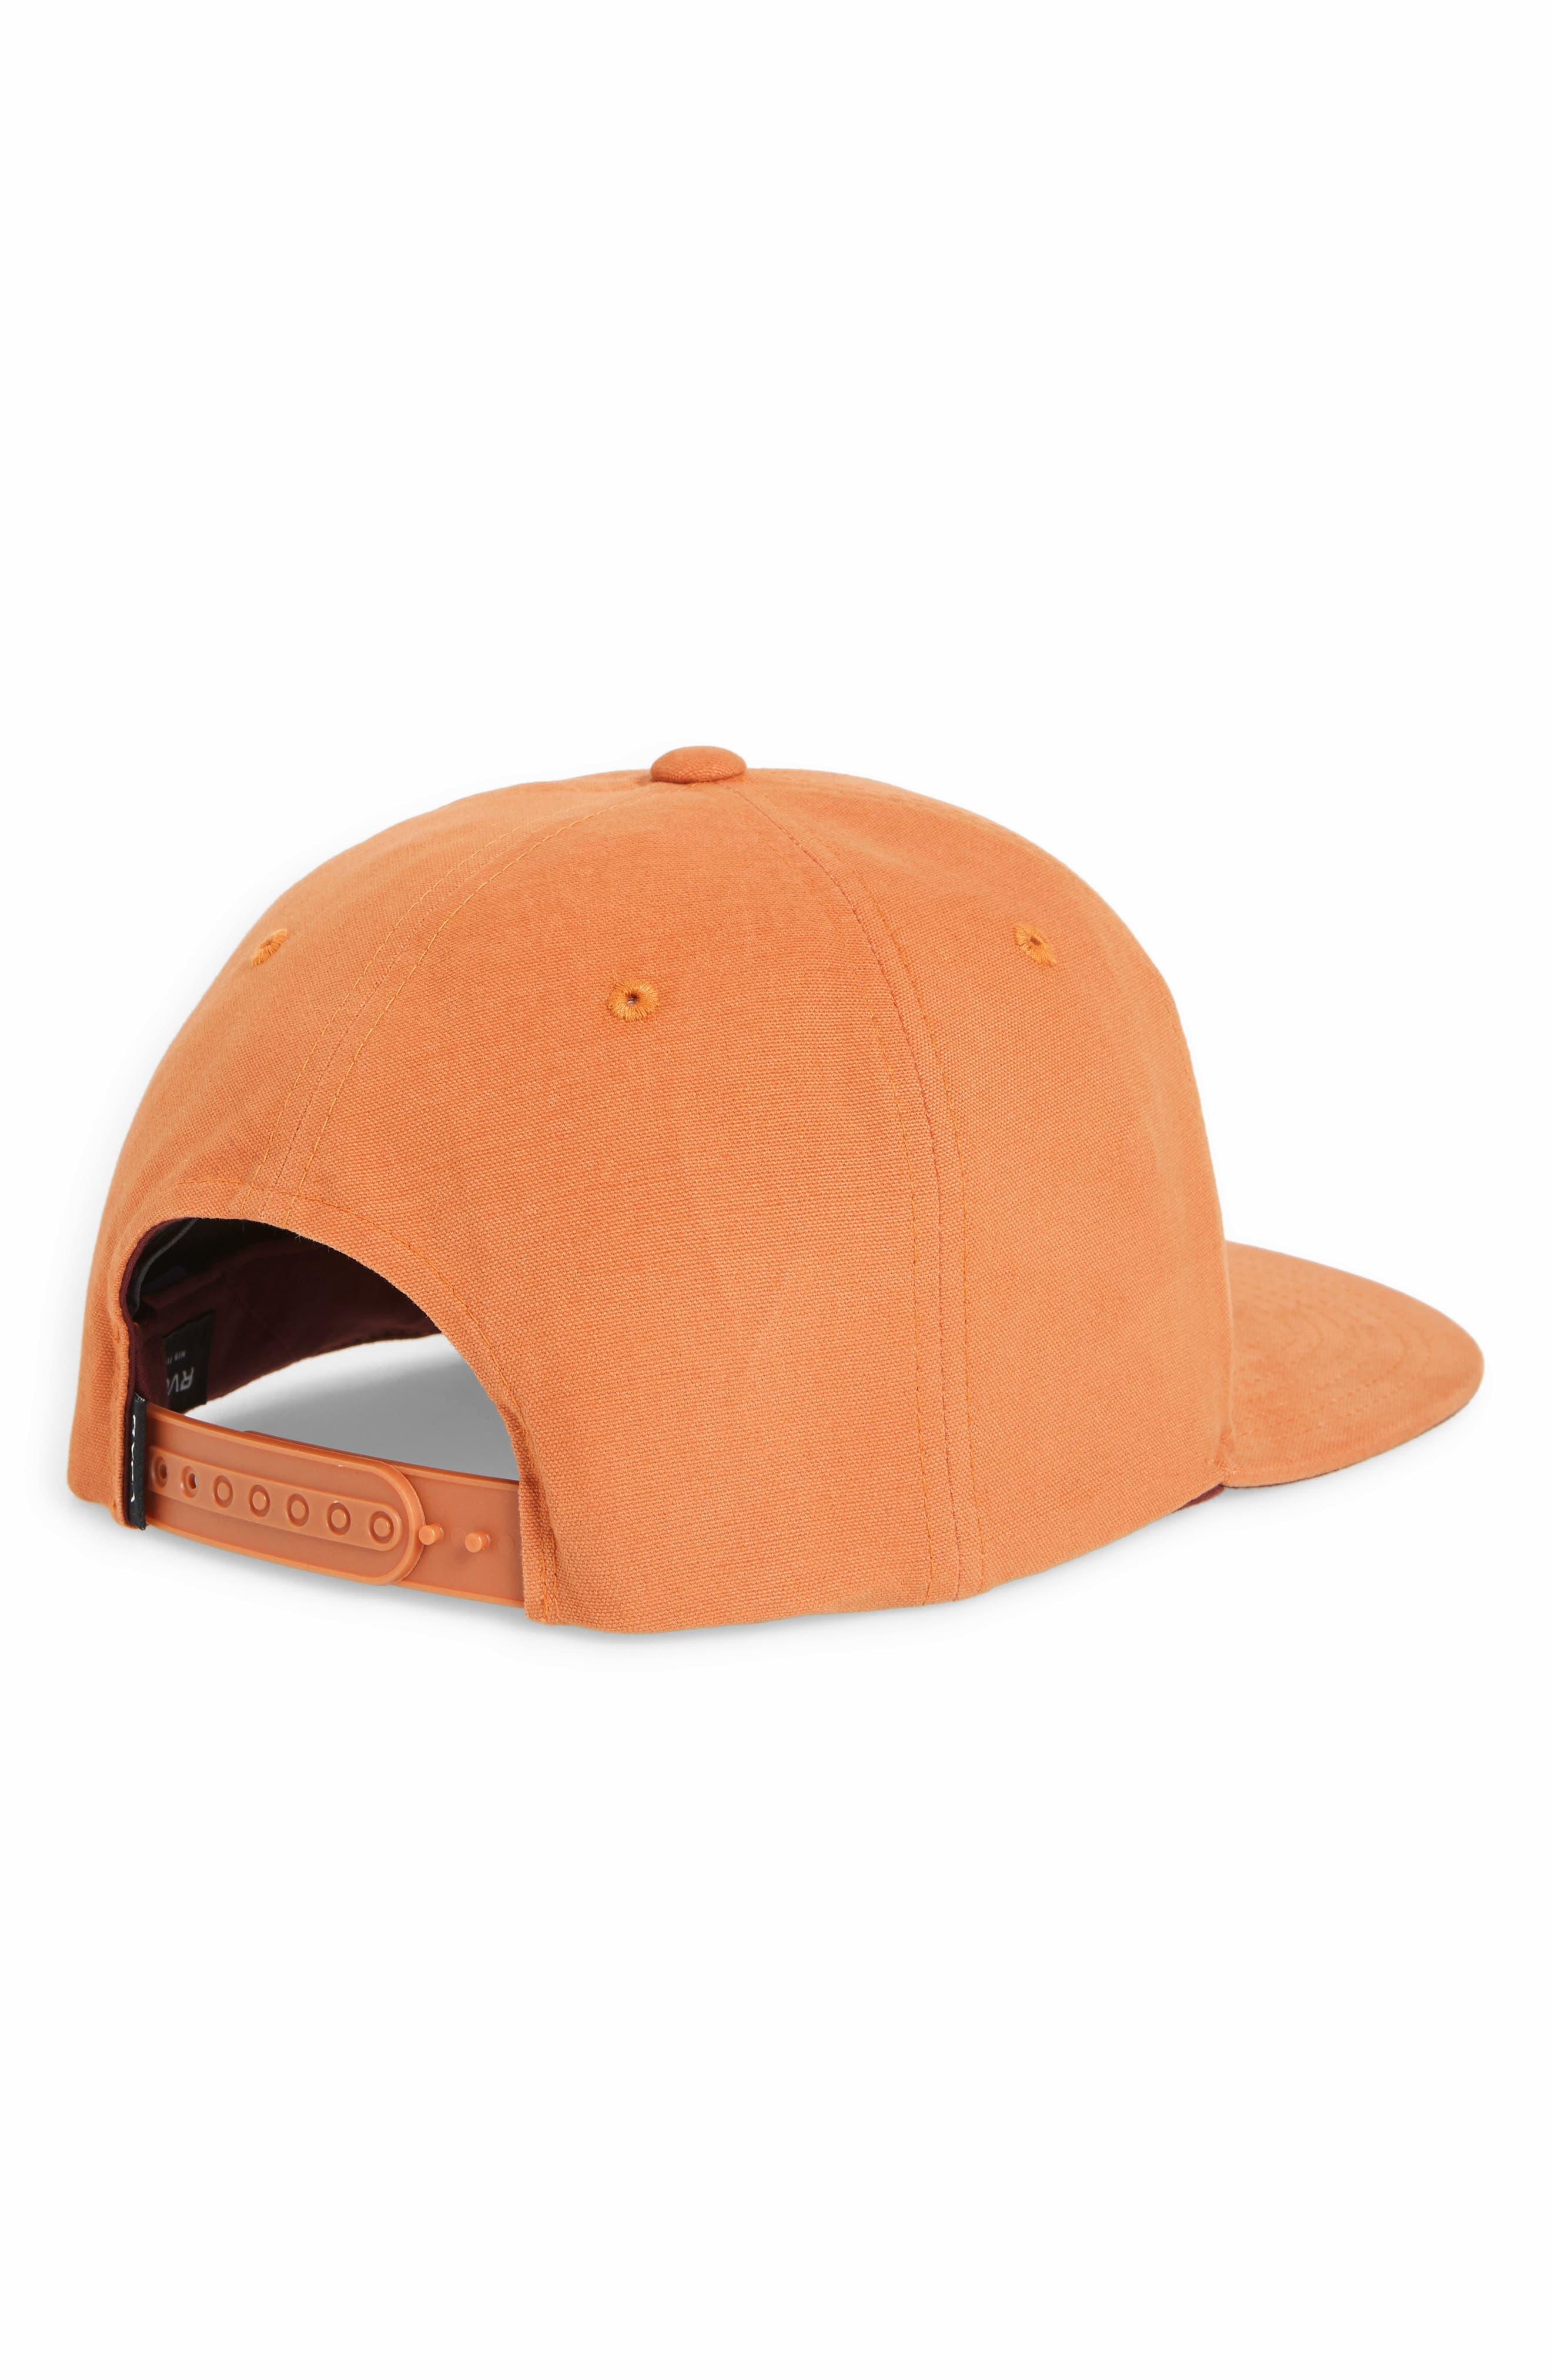 RVCA, VA Snapback II Snapback Hat, Alternate thumbnail 2, color, BRICK RED